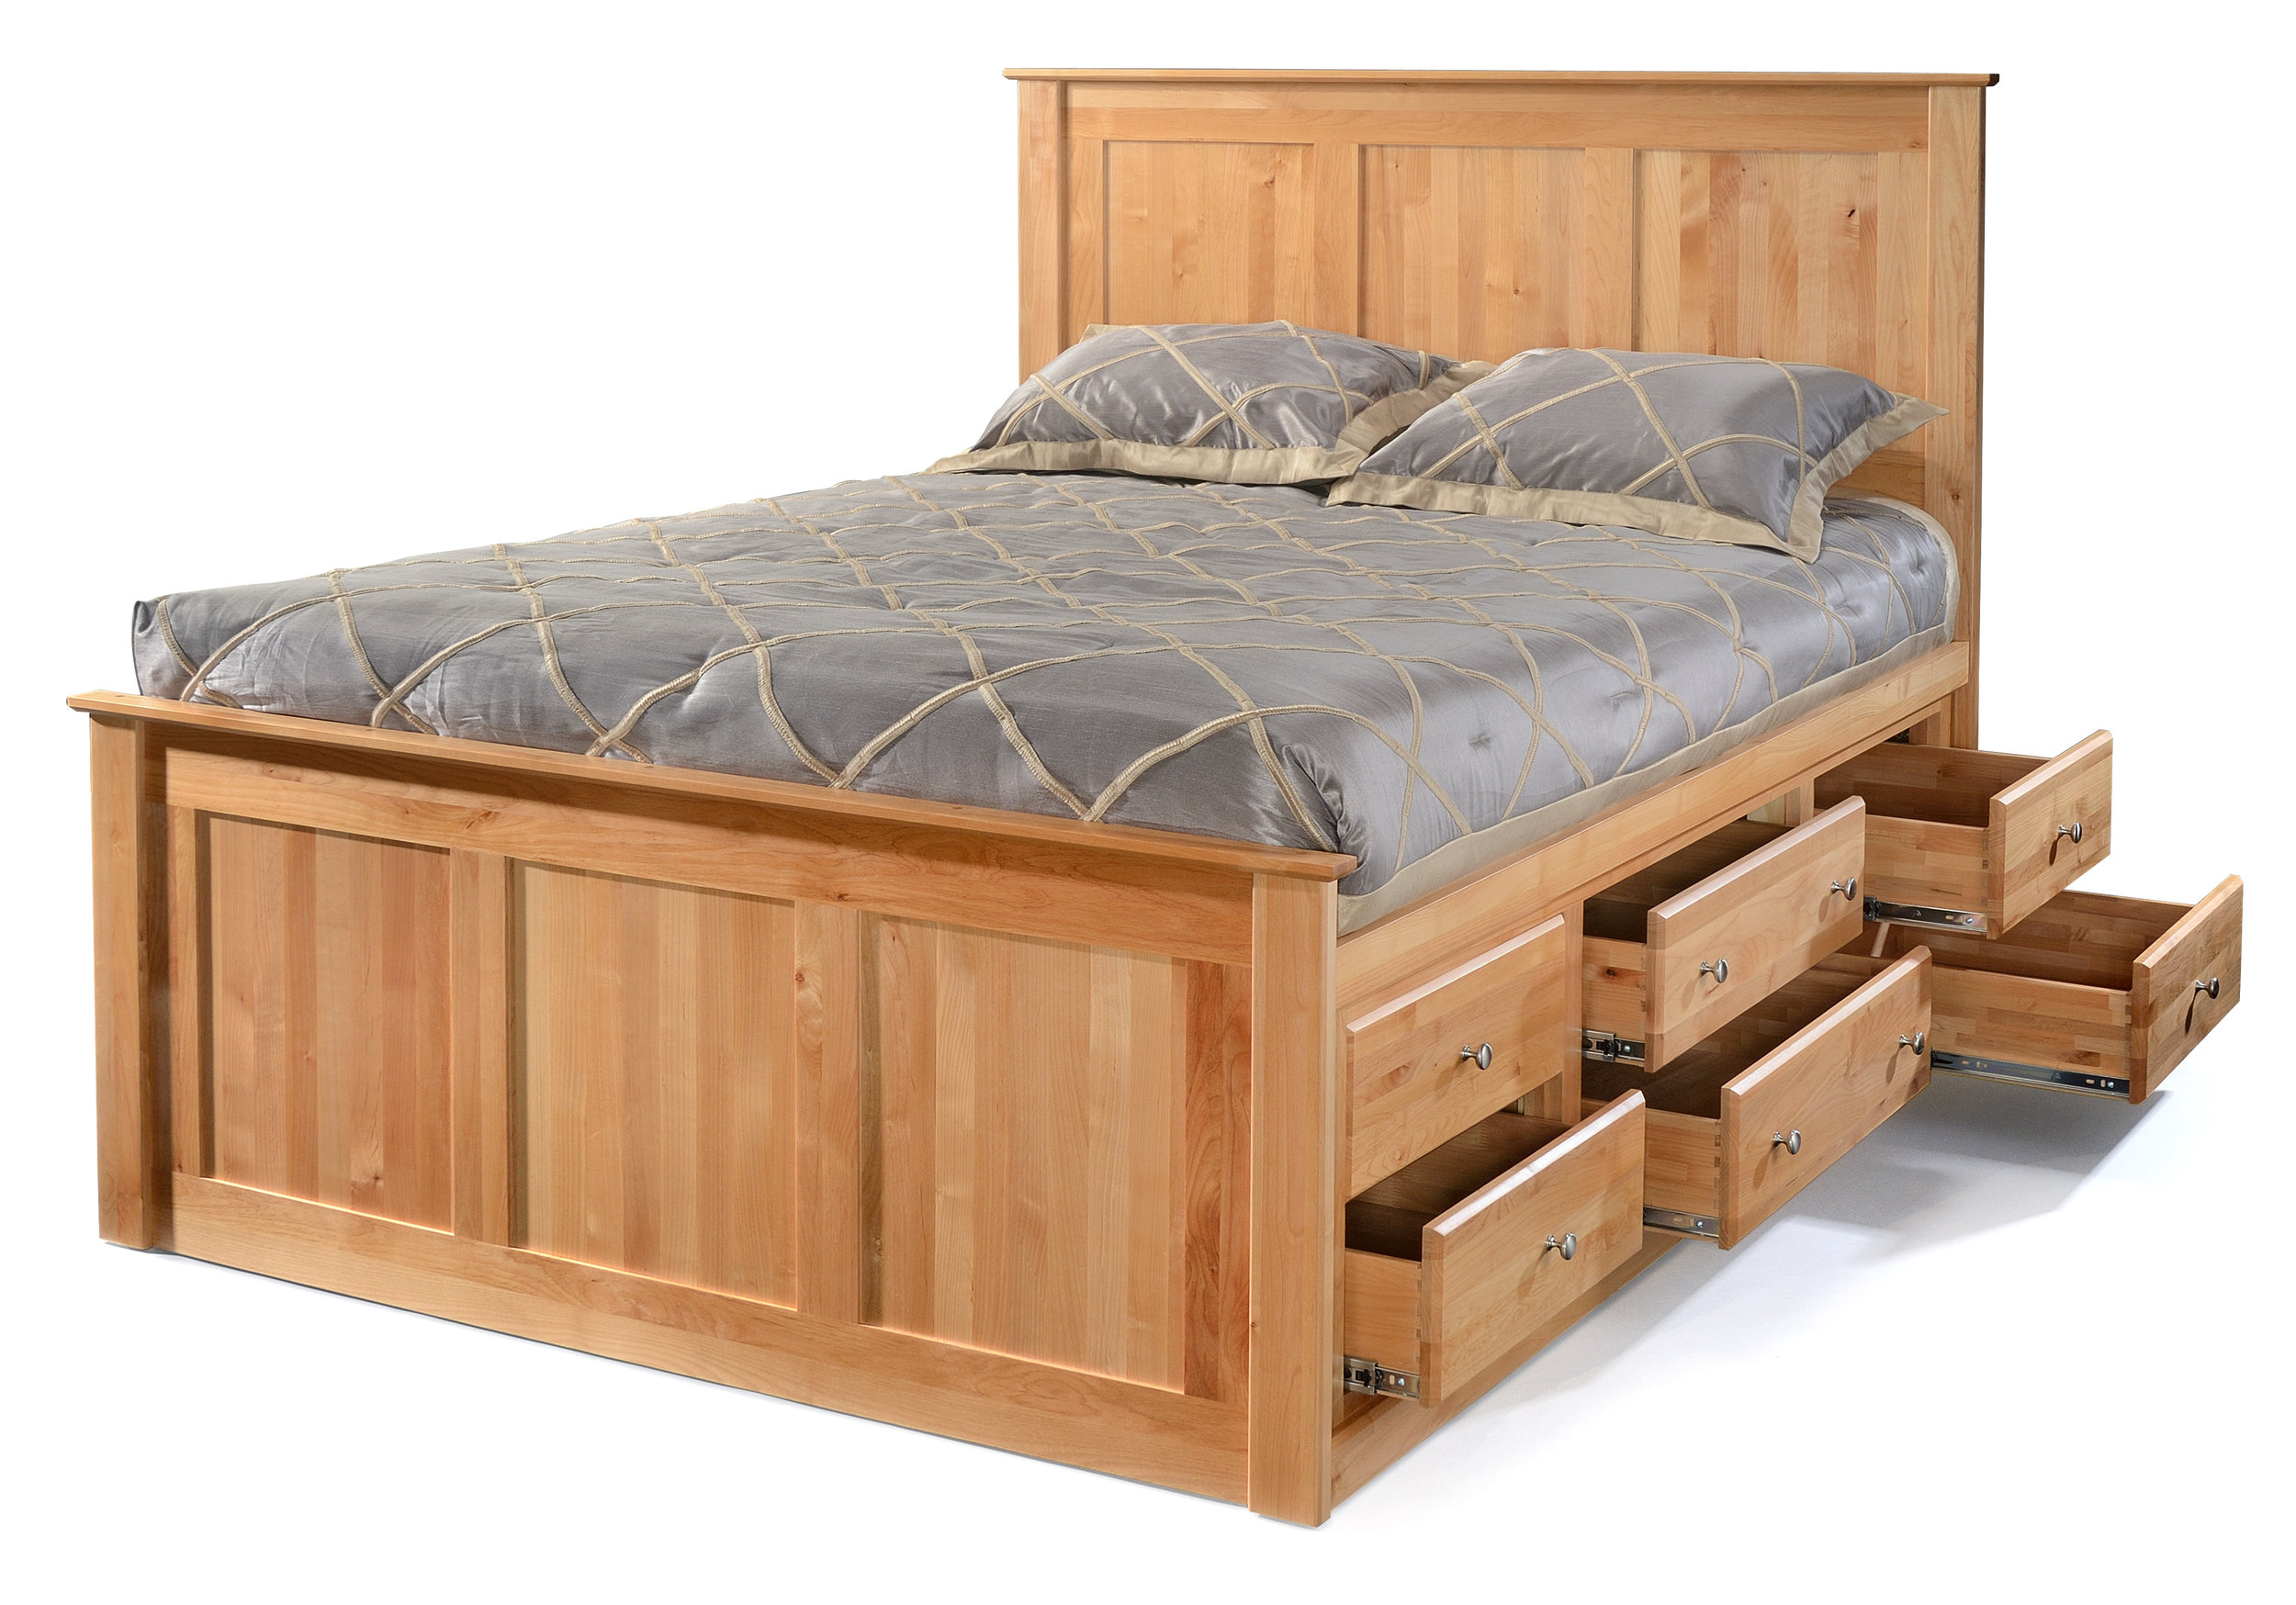 Alder Beds - Archbold - Tall storage bed 6 drawers - Finished.jpg